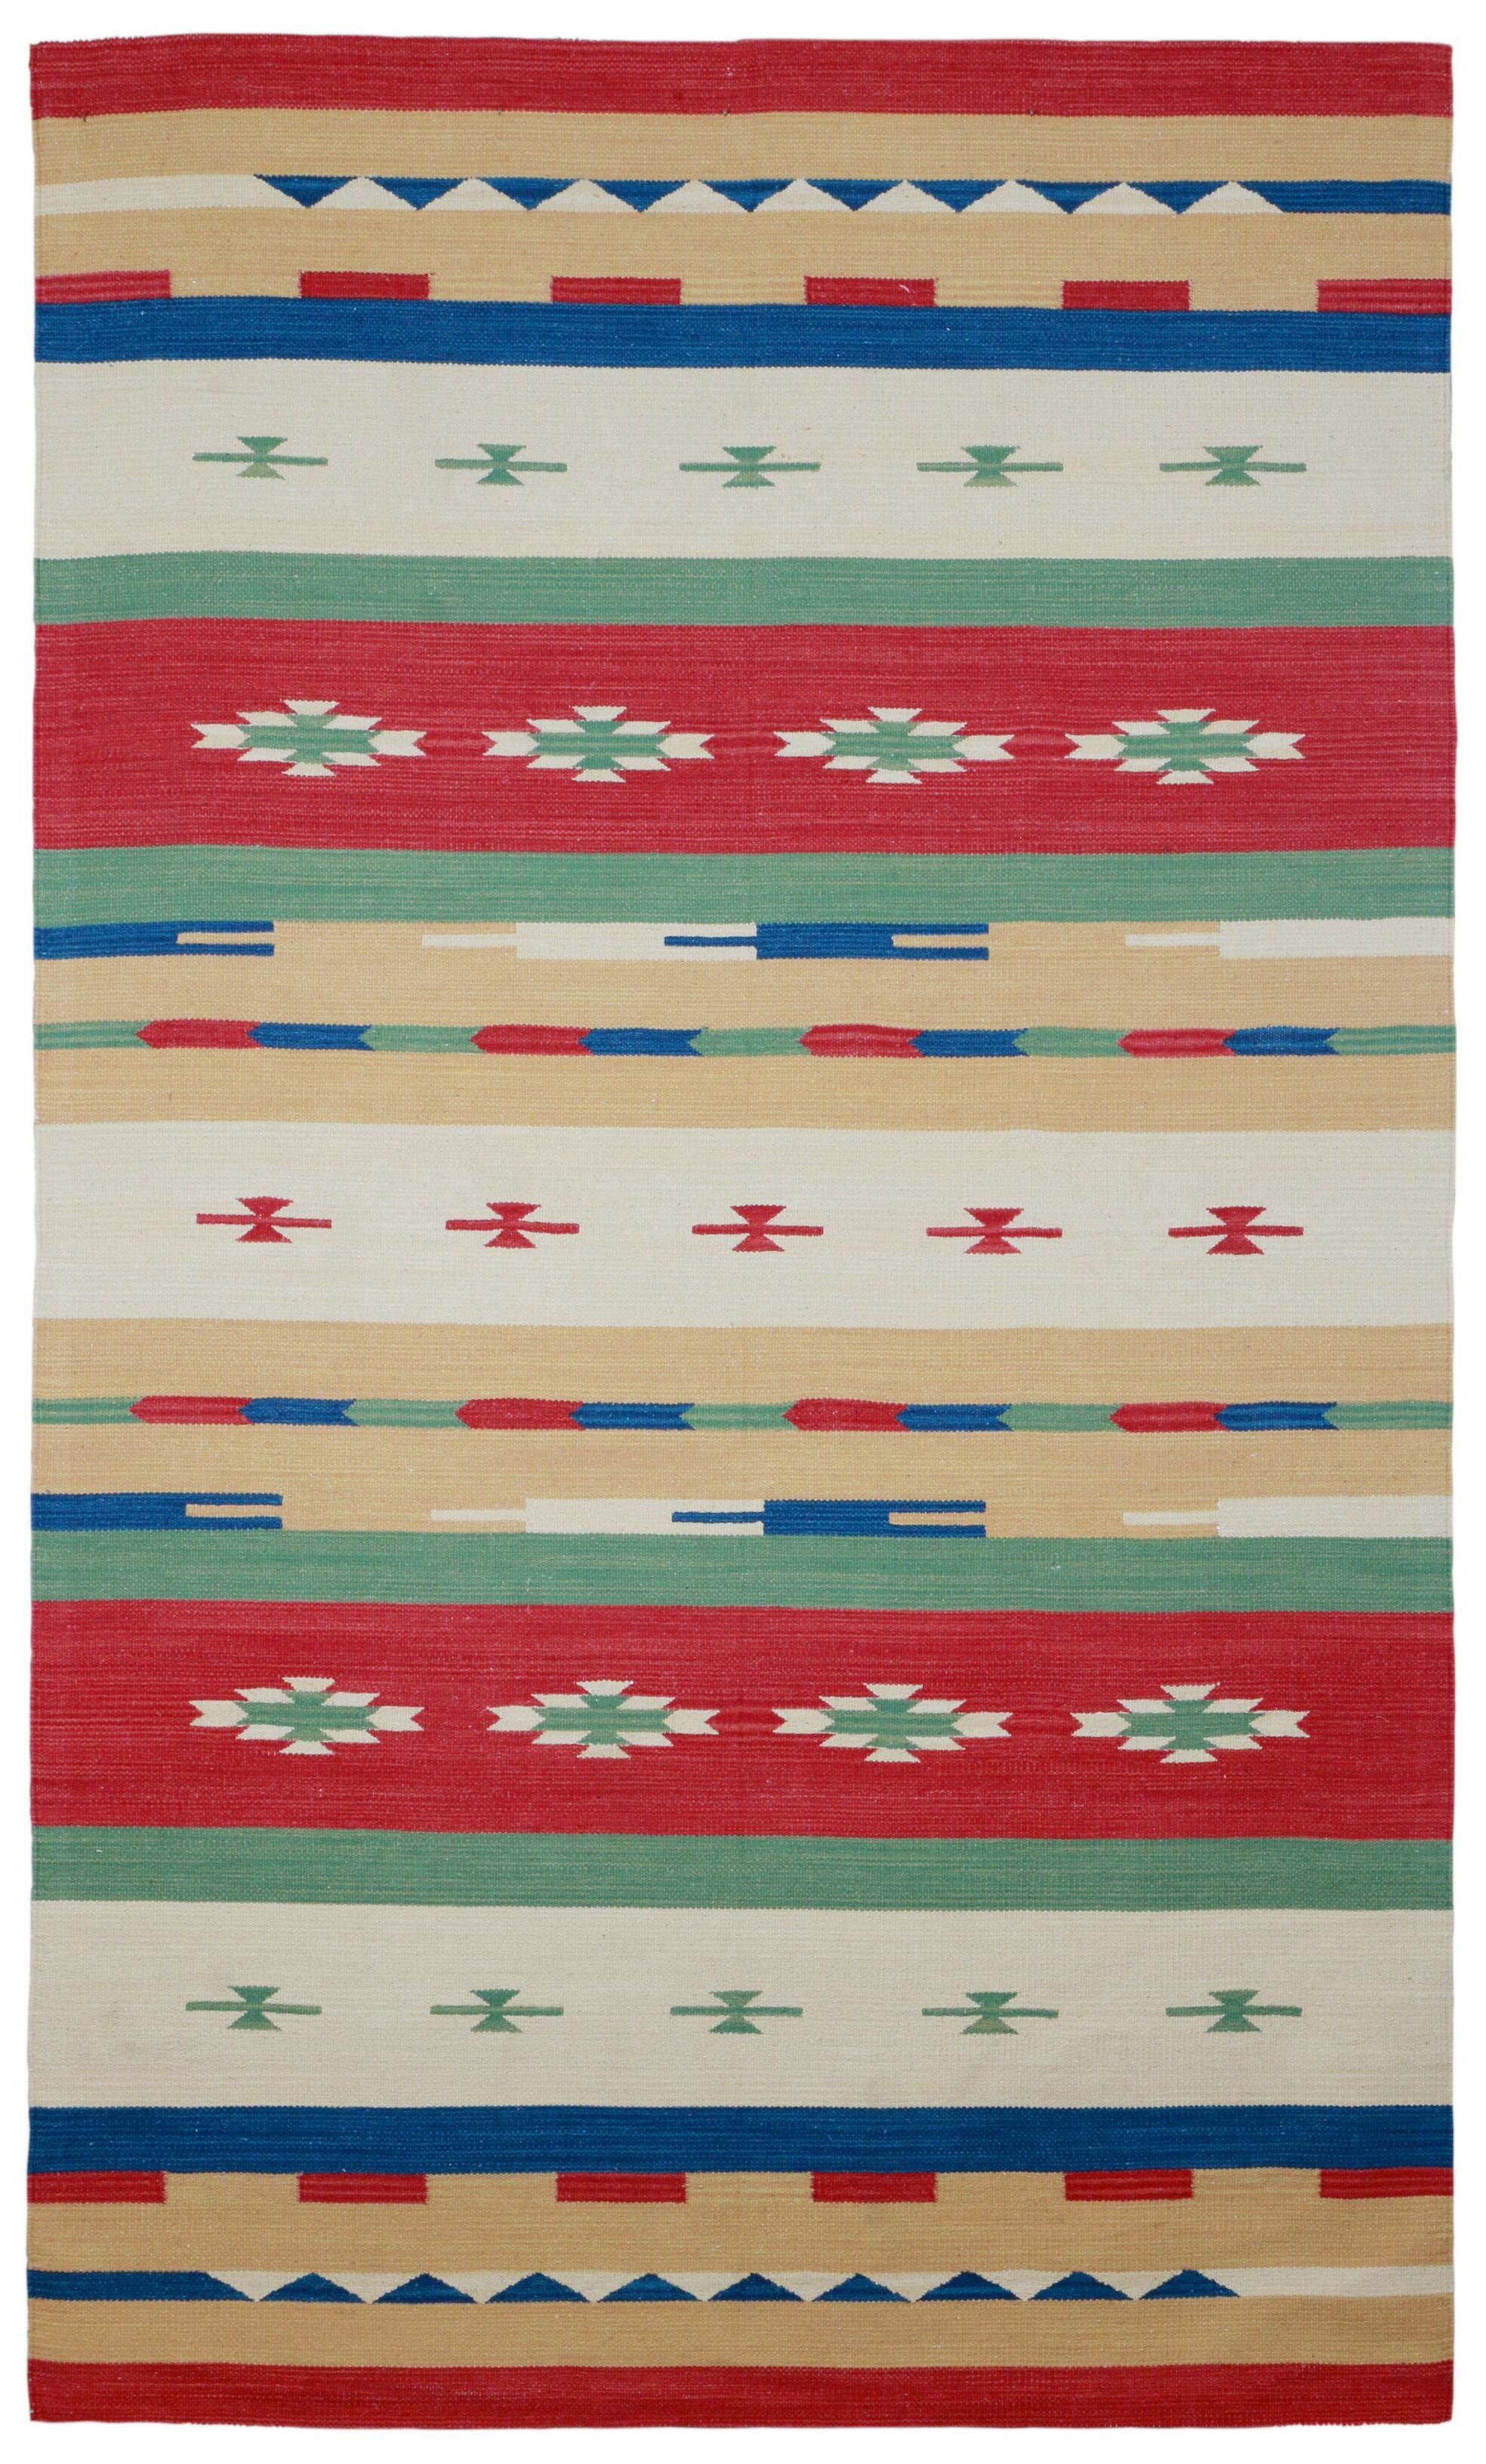 Sedona Hand-Woven Red Area Rug Rug Size: 4' x 6'